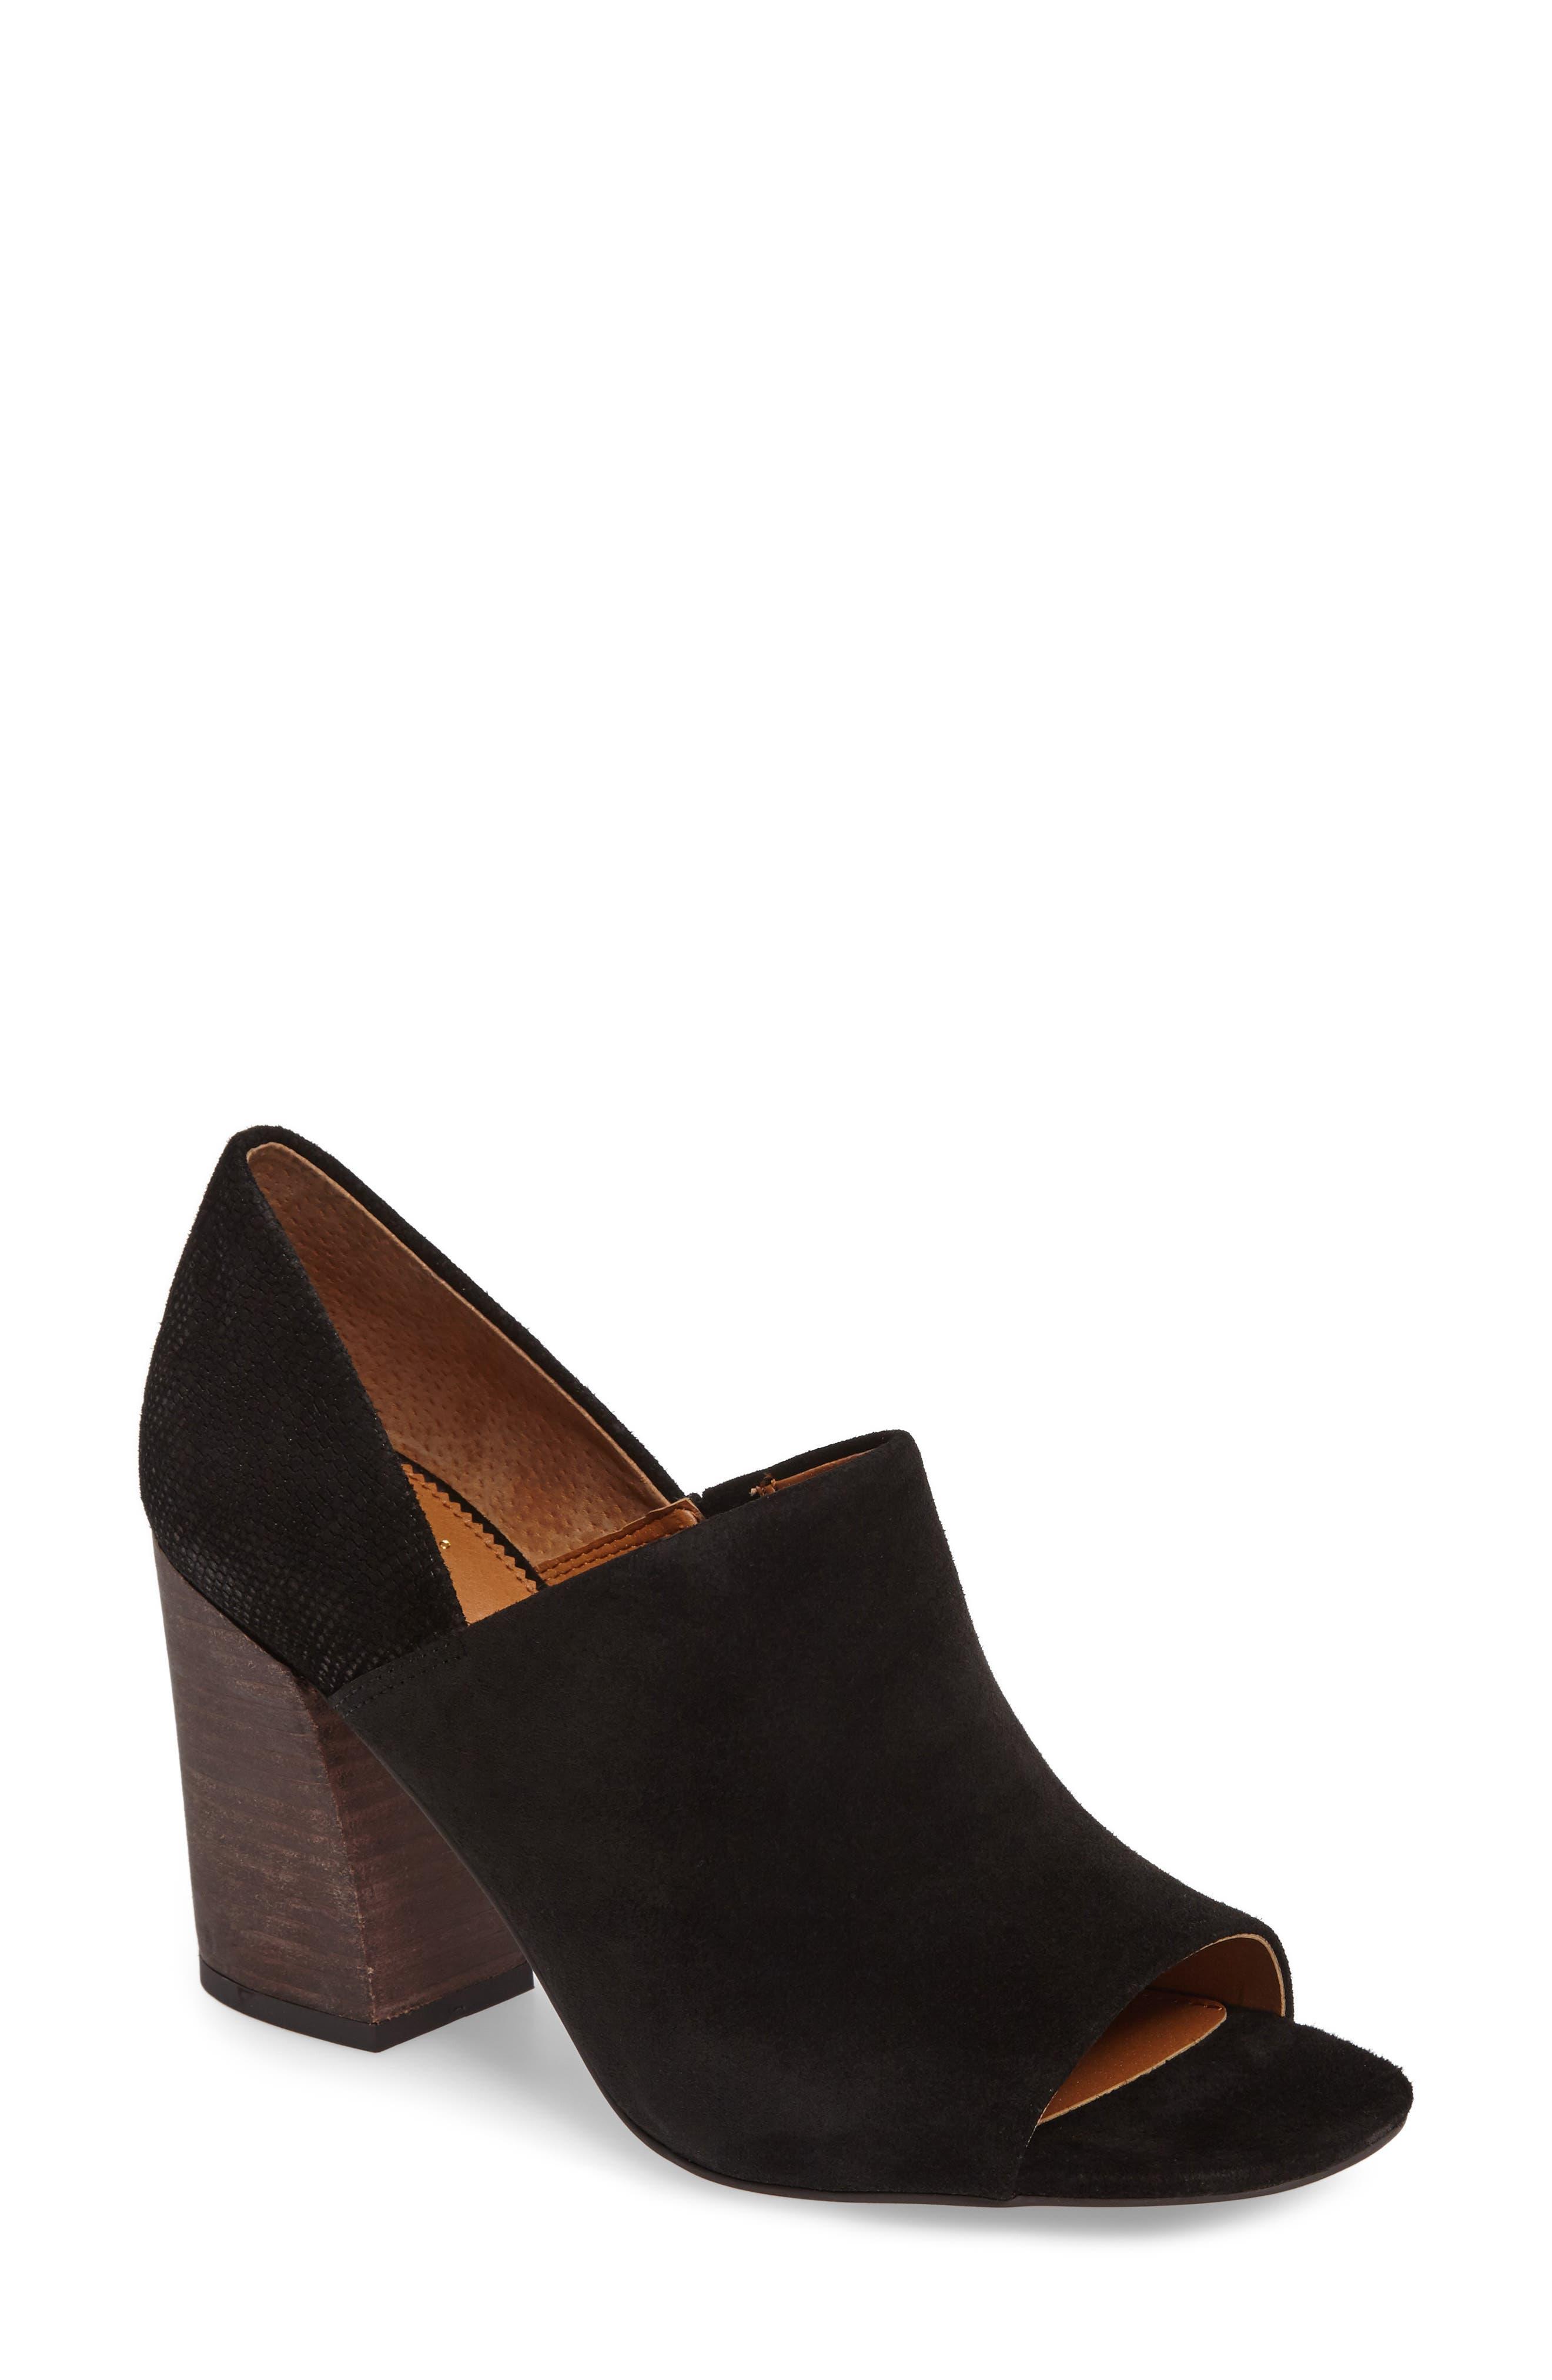 Ellison Block Heel Sandal,                             Main thumbnail 1, color,                             001